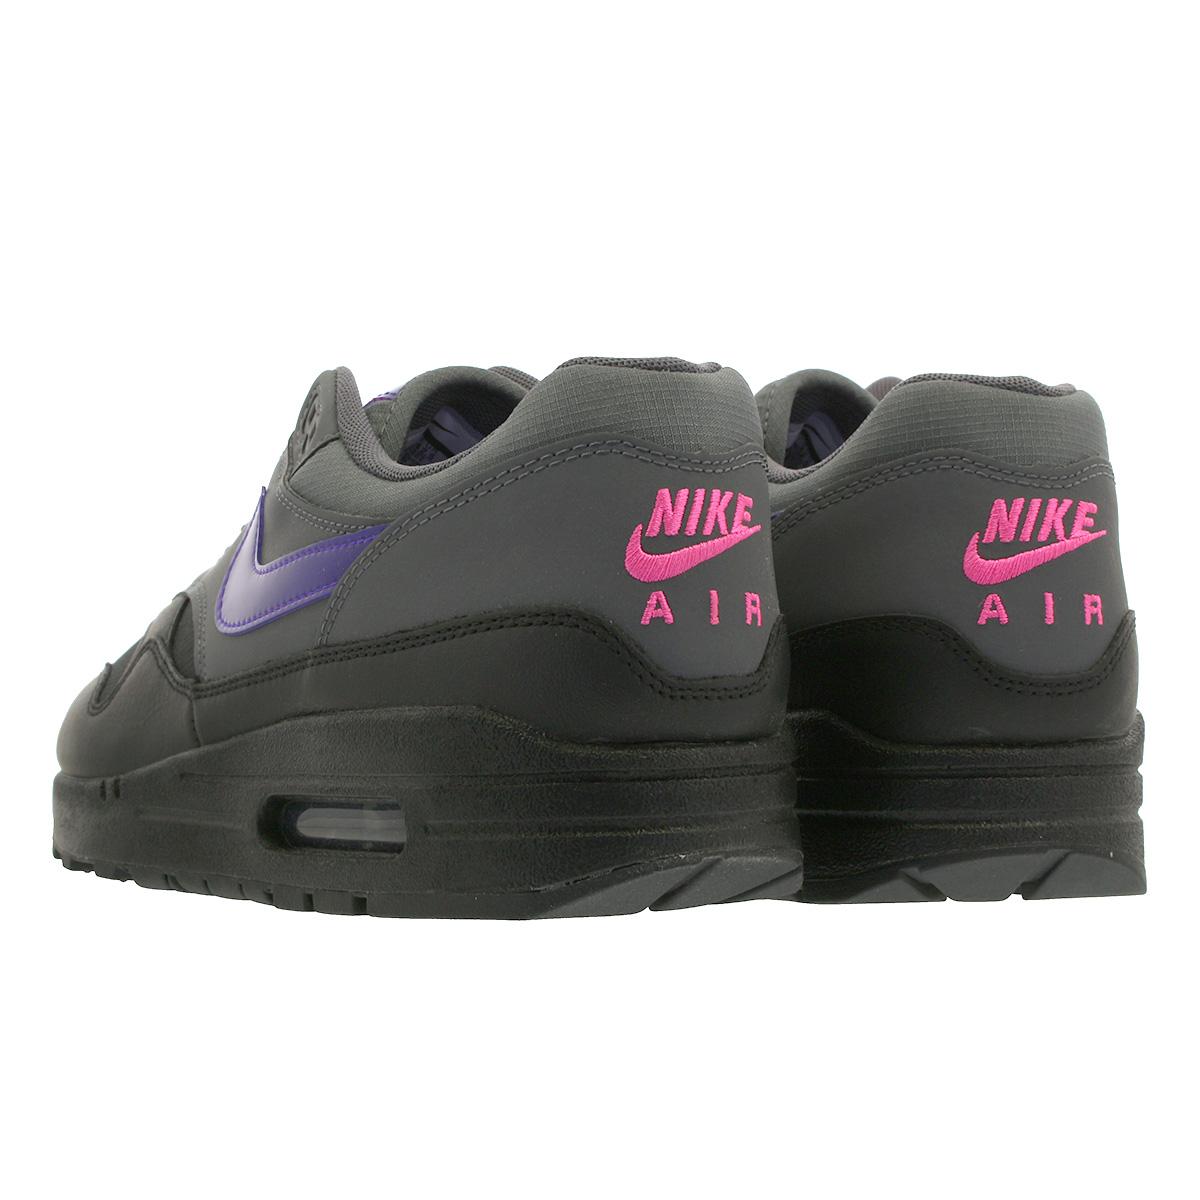 Nike Air Max 1 Black Grey Purple AR1249 002 | Trainers